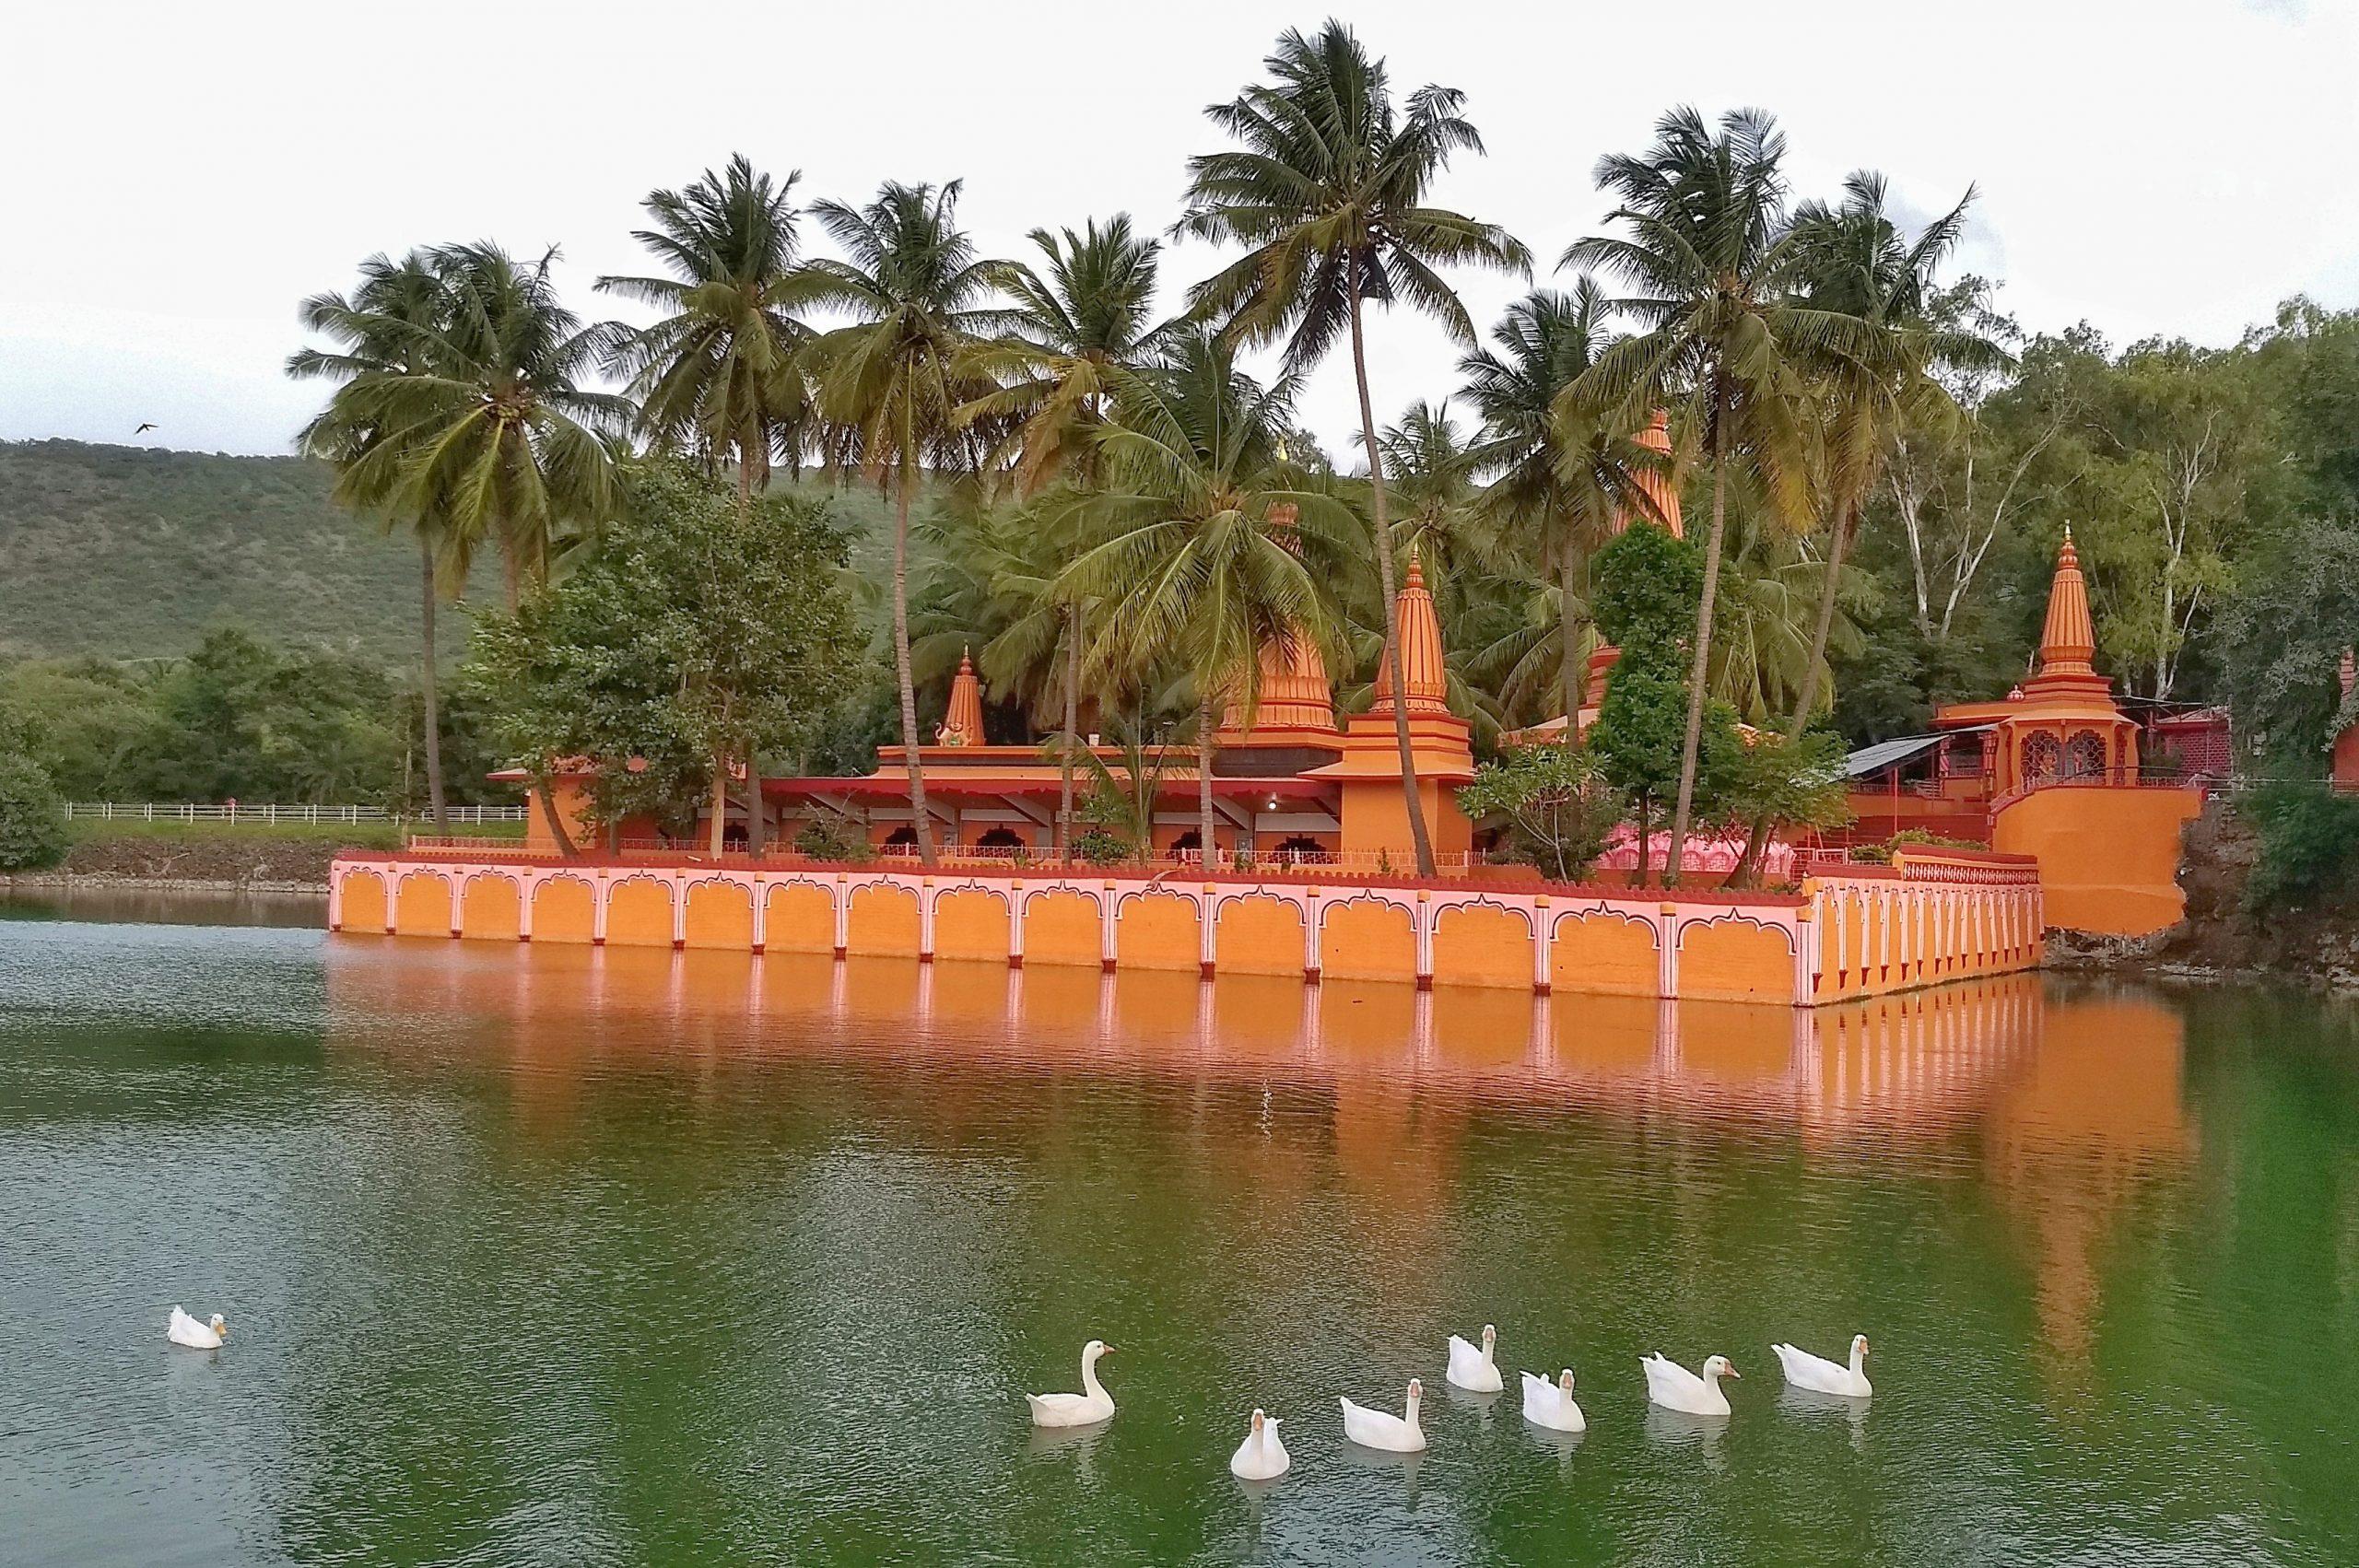 Ramdara Temple in India